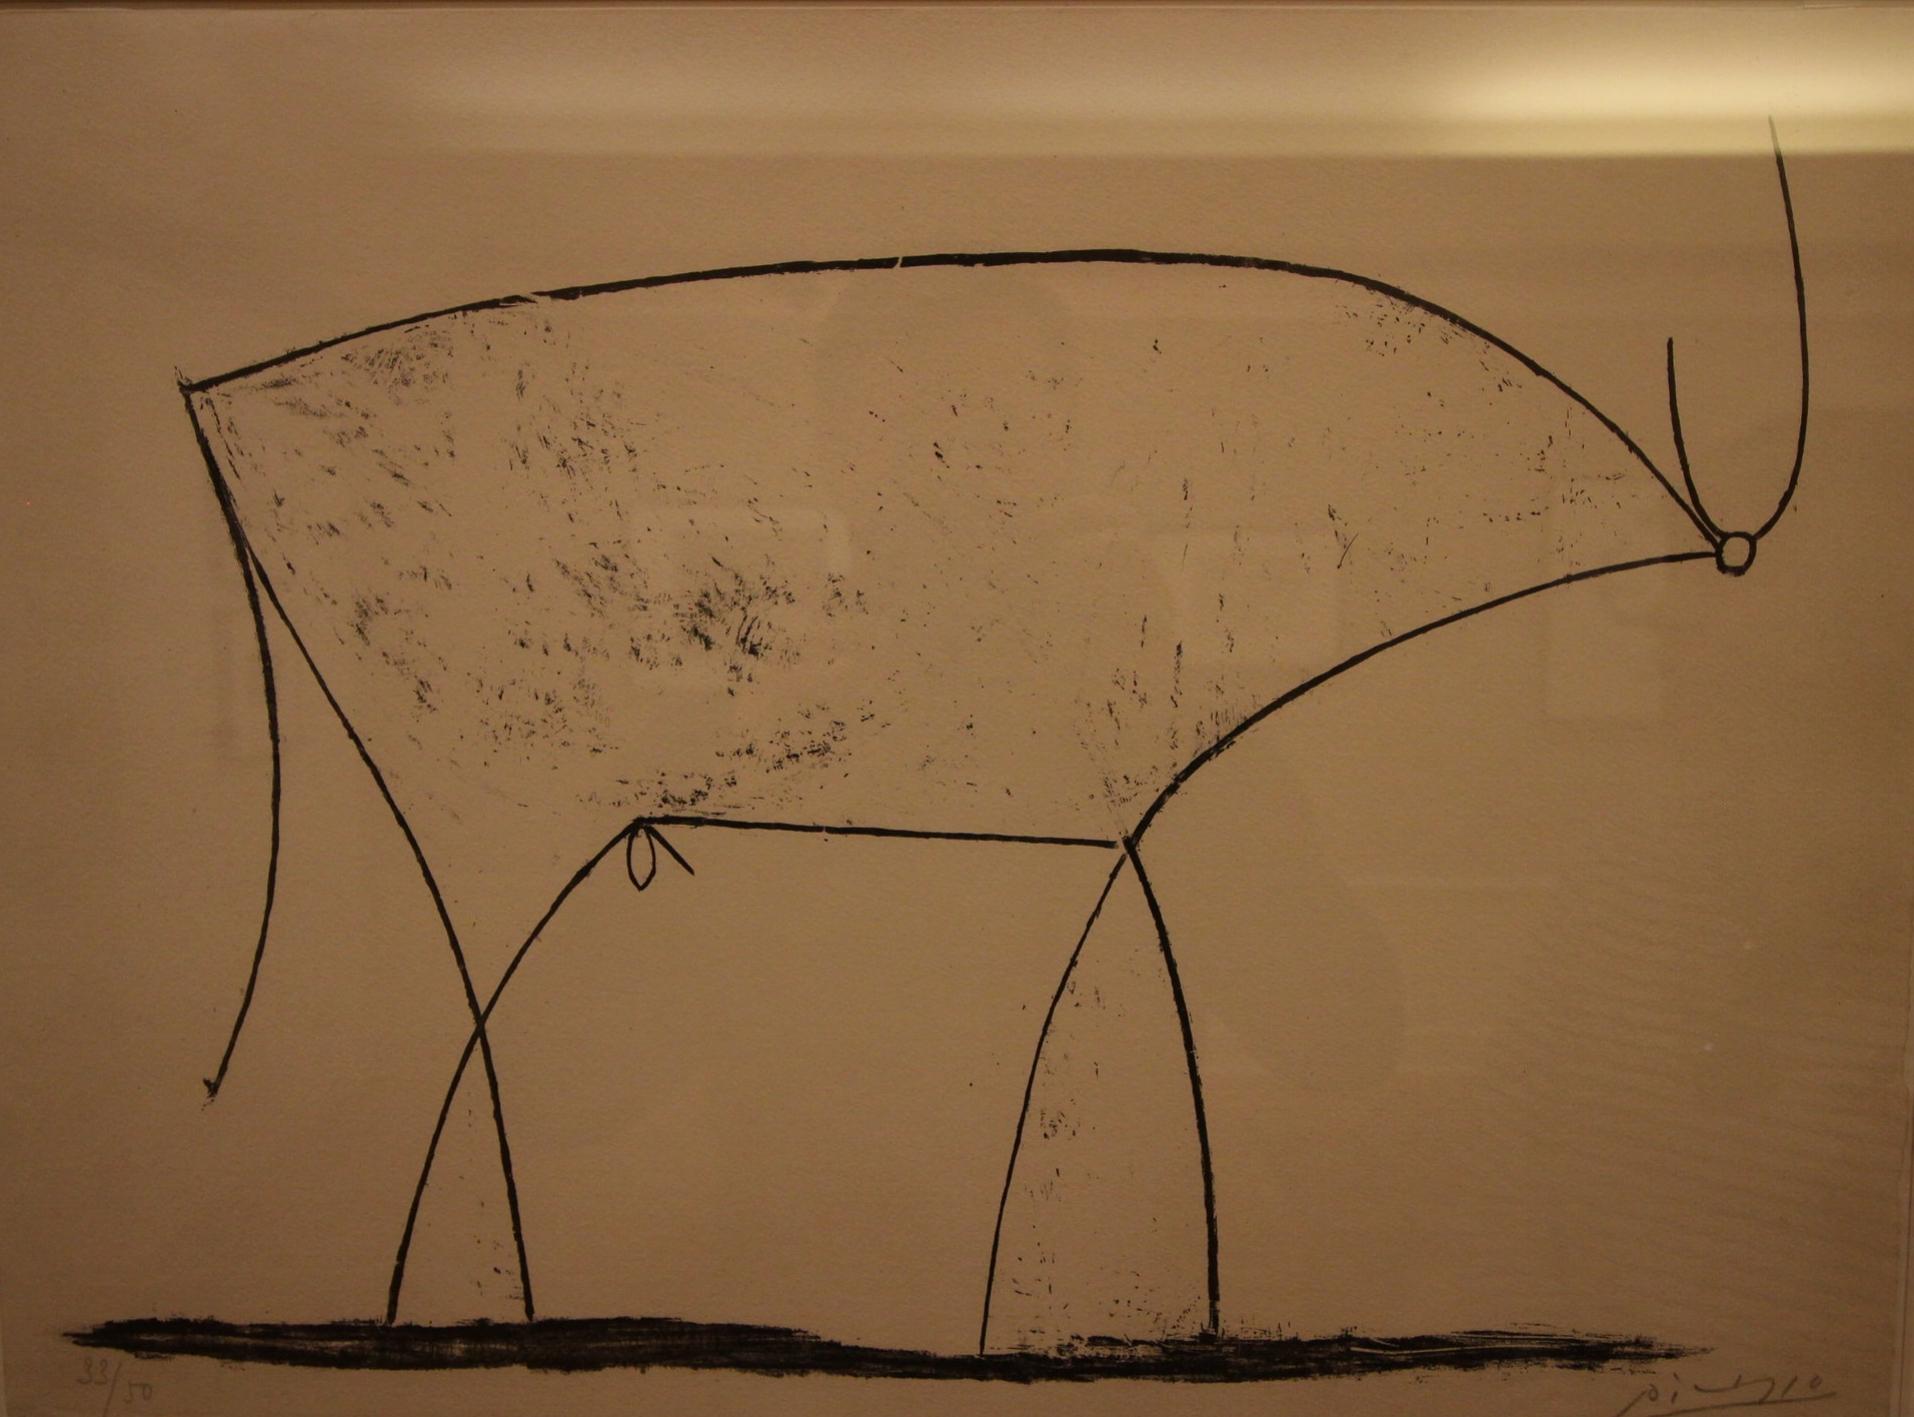 Pablo Picasso,   Le Taureau (Bull)  , 1946, Lithograph on cream wove paper